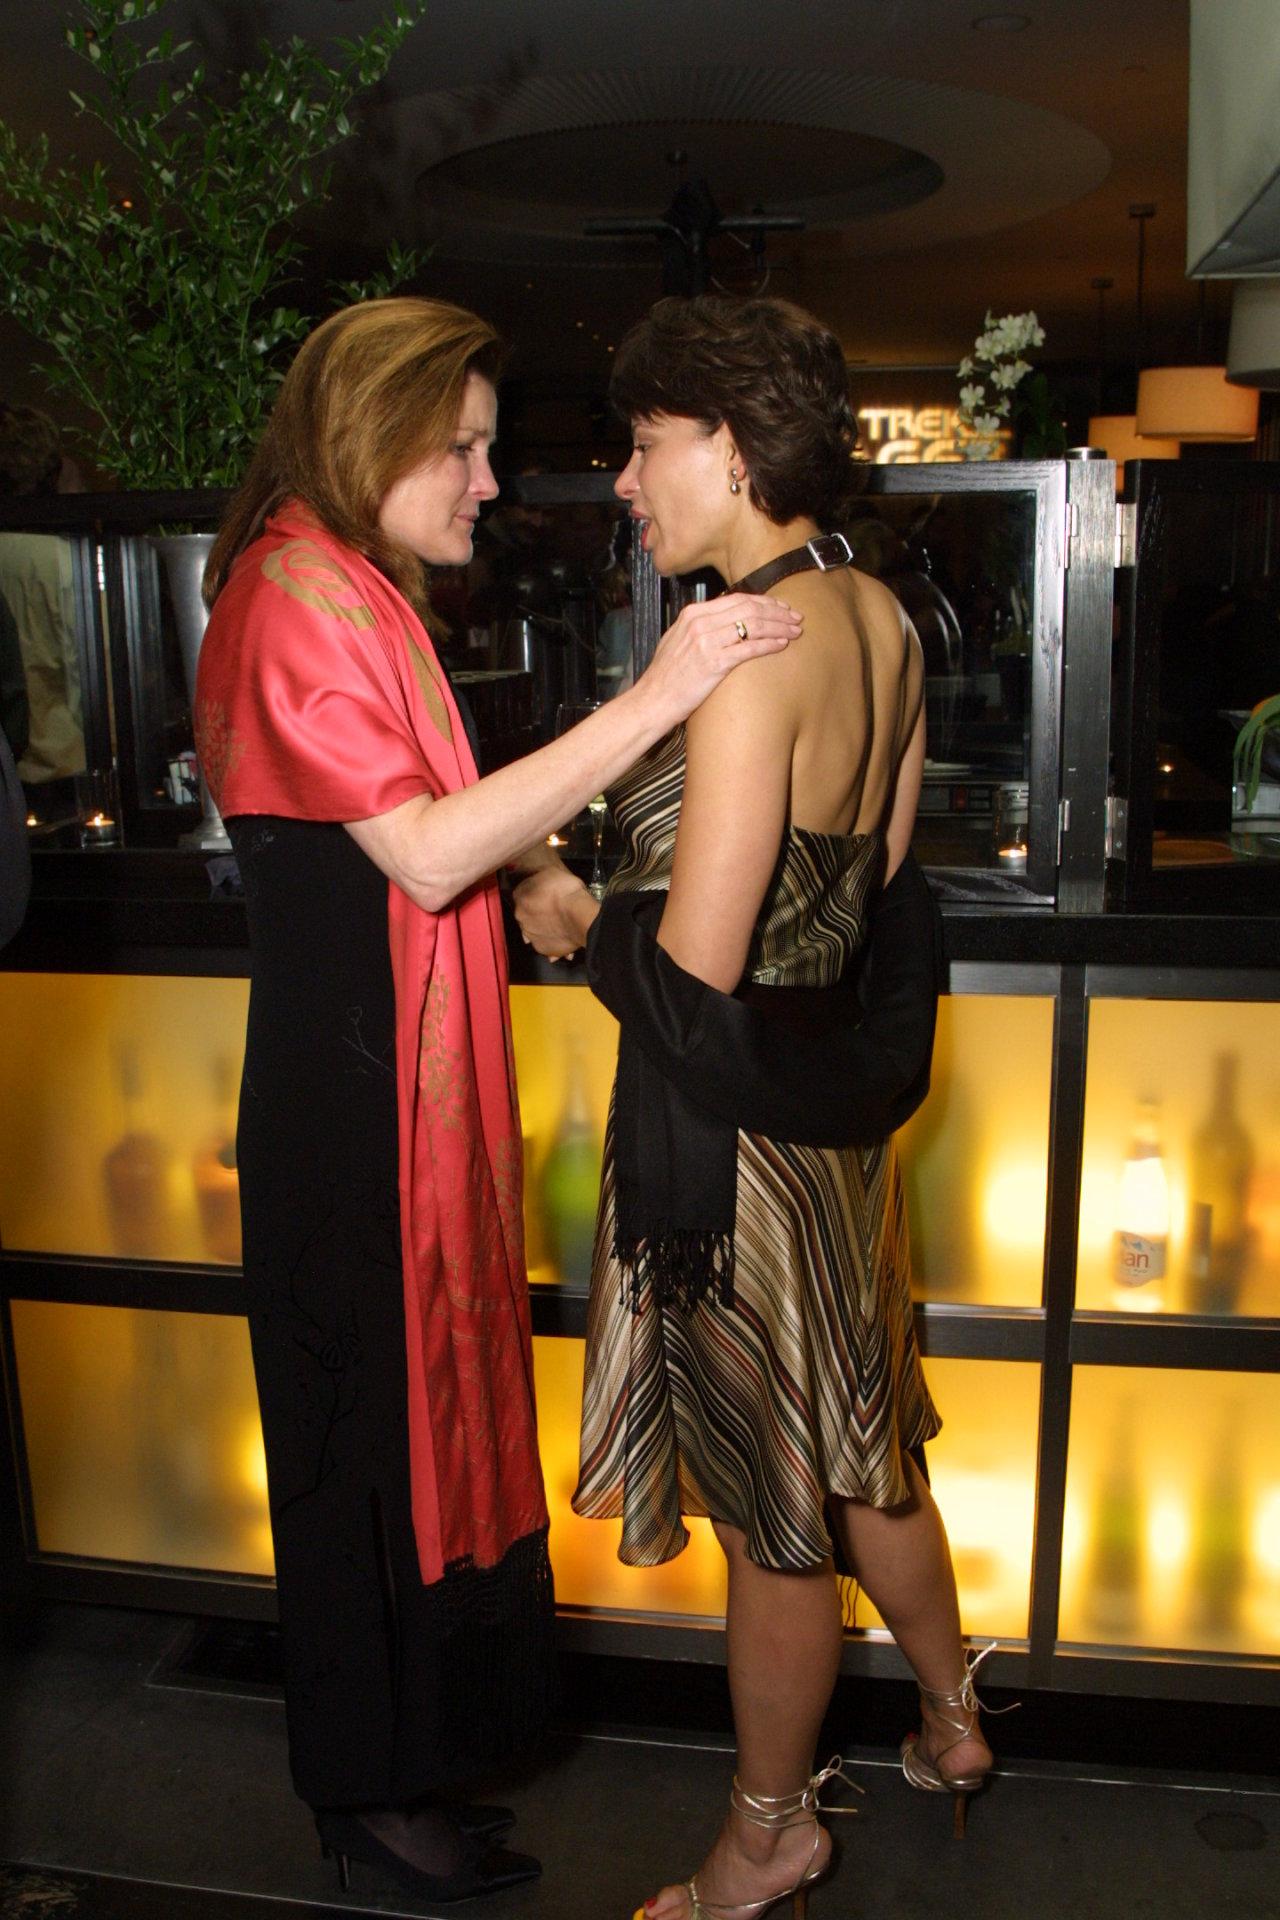 Nina Arsenault,Marianne Shine XXX pic May Tager ISR,Isabella Calthorpe